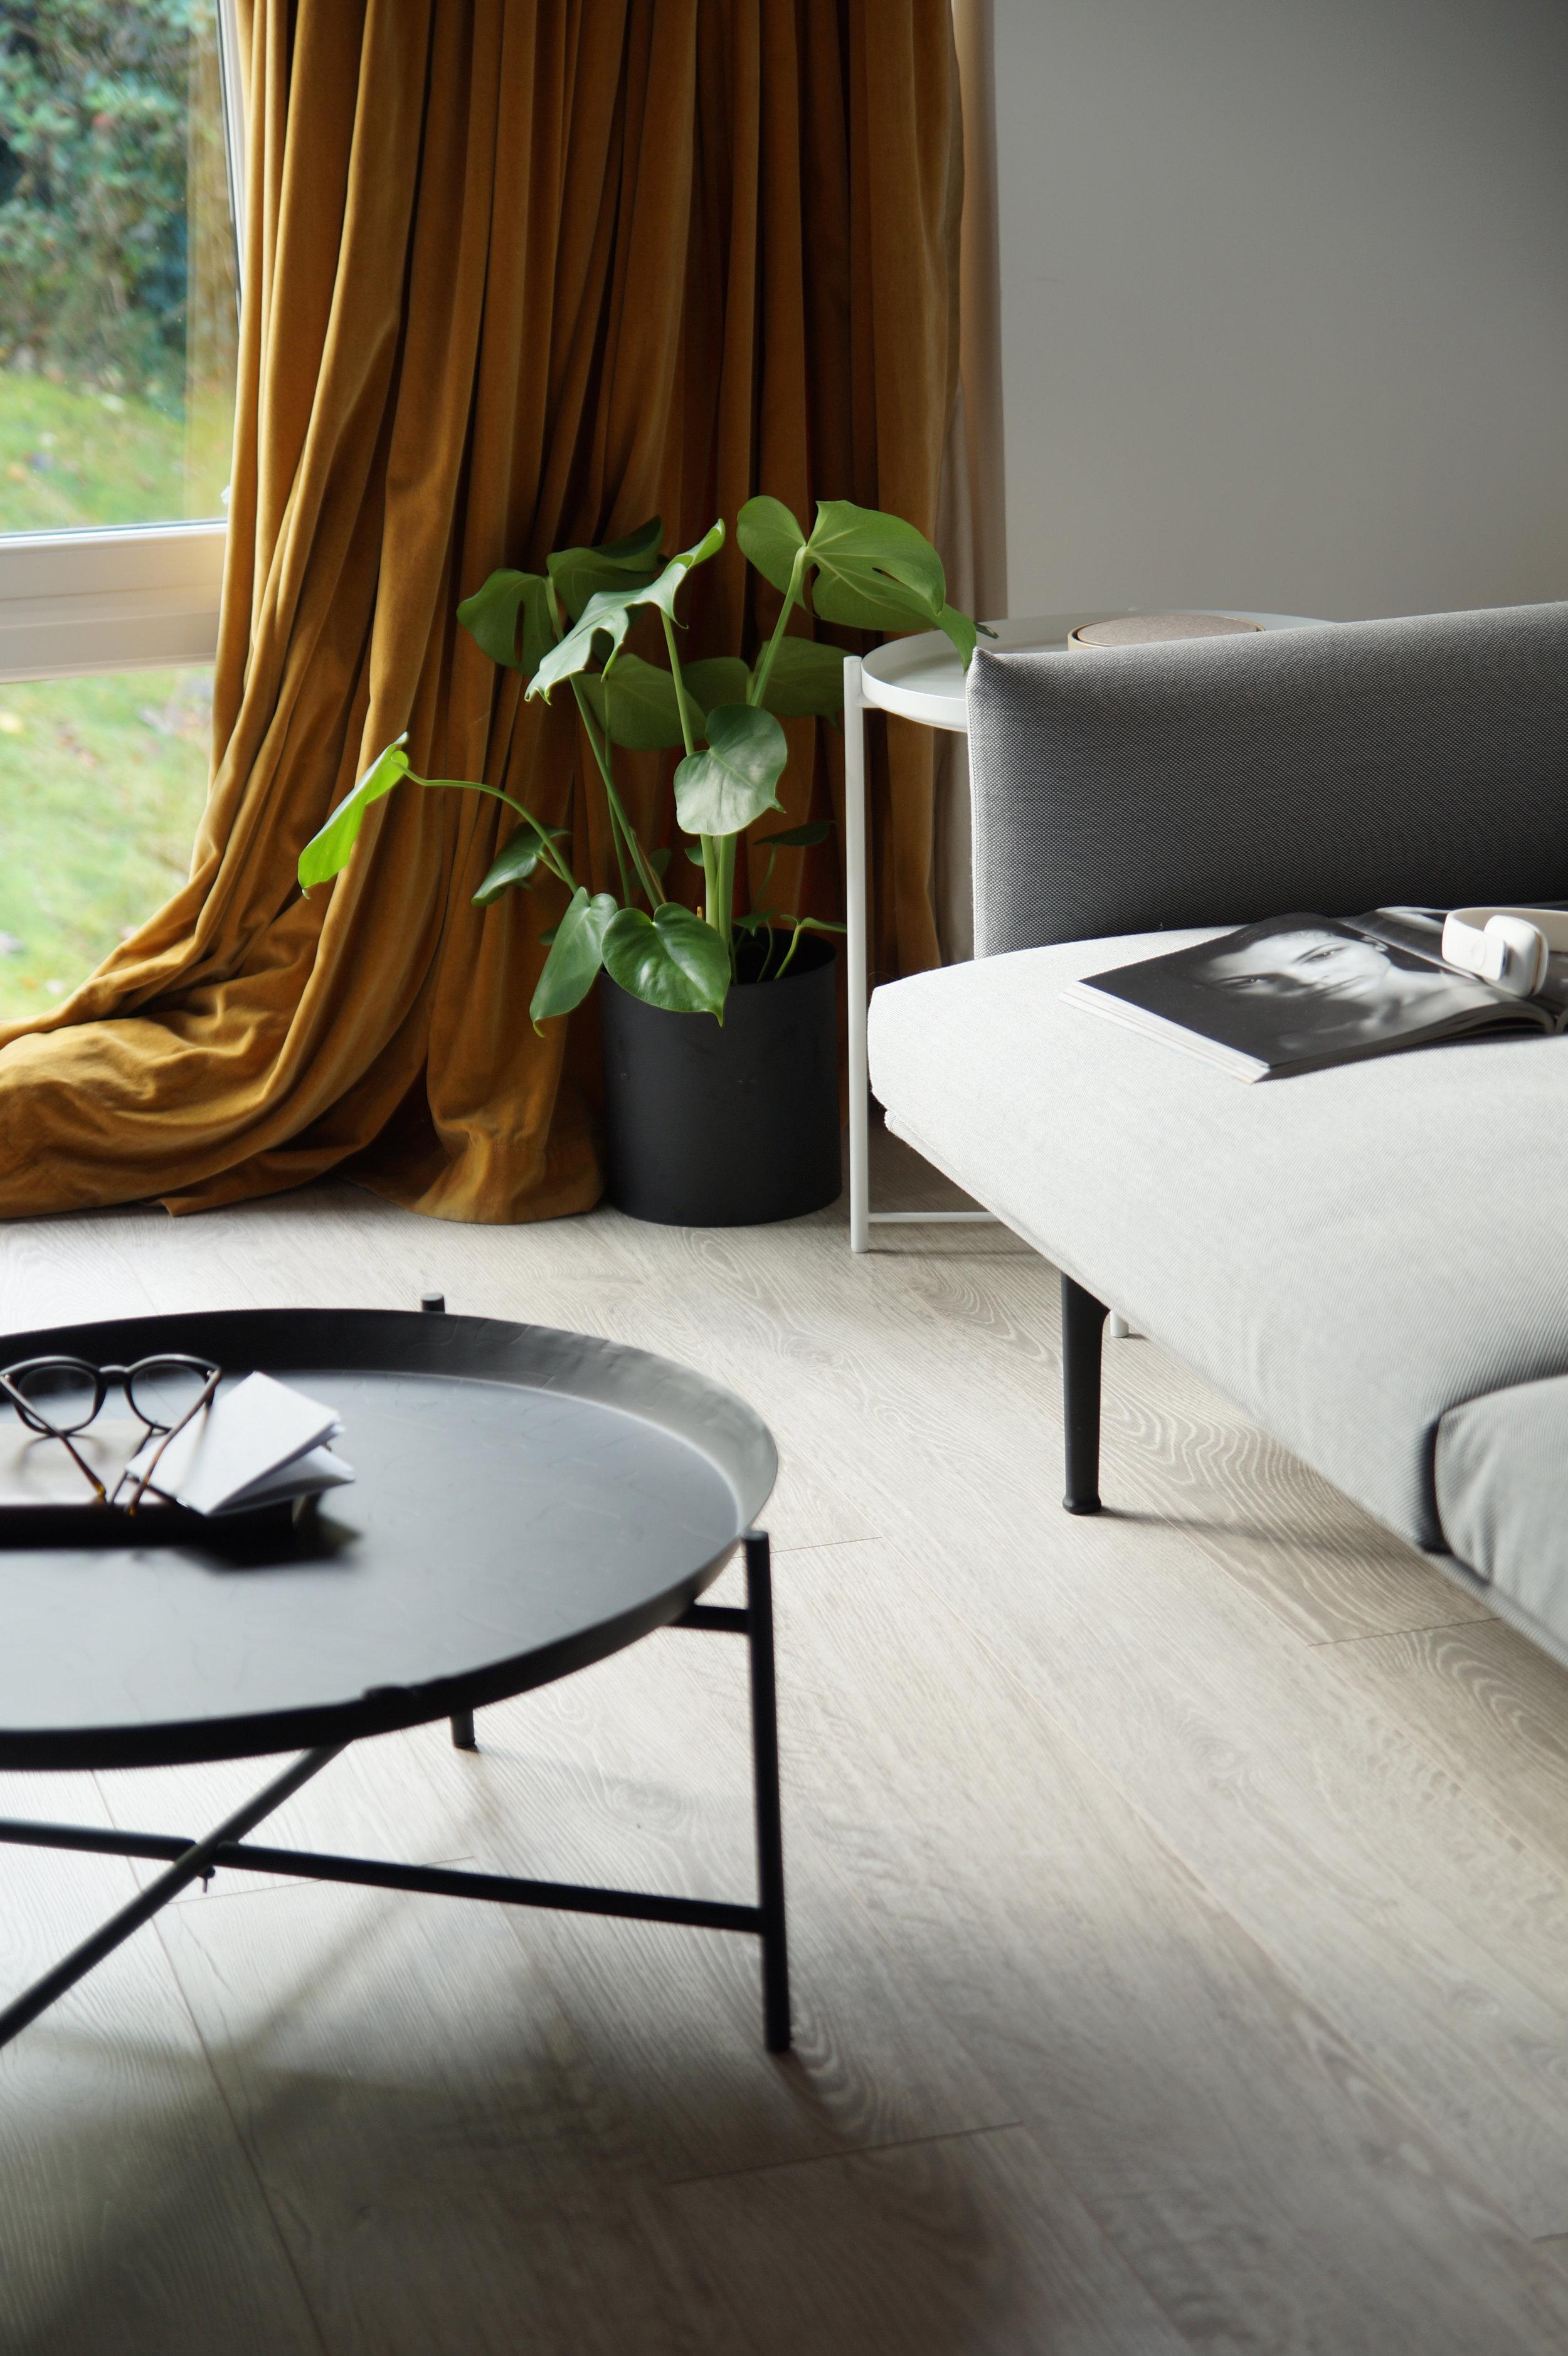 Hege Morris - scandi minimalism on a budget